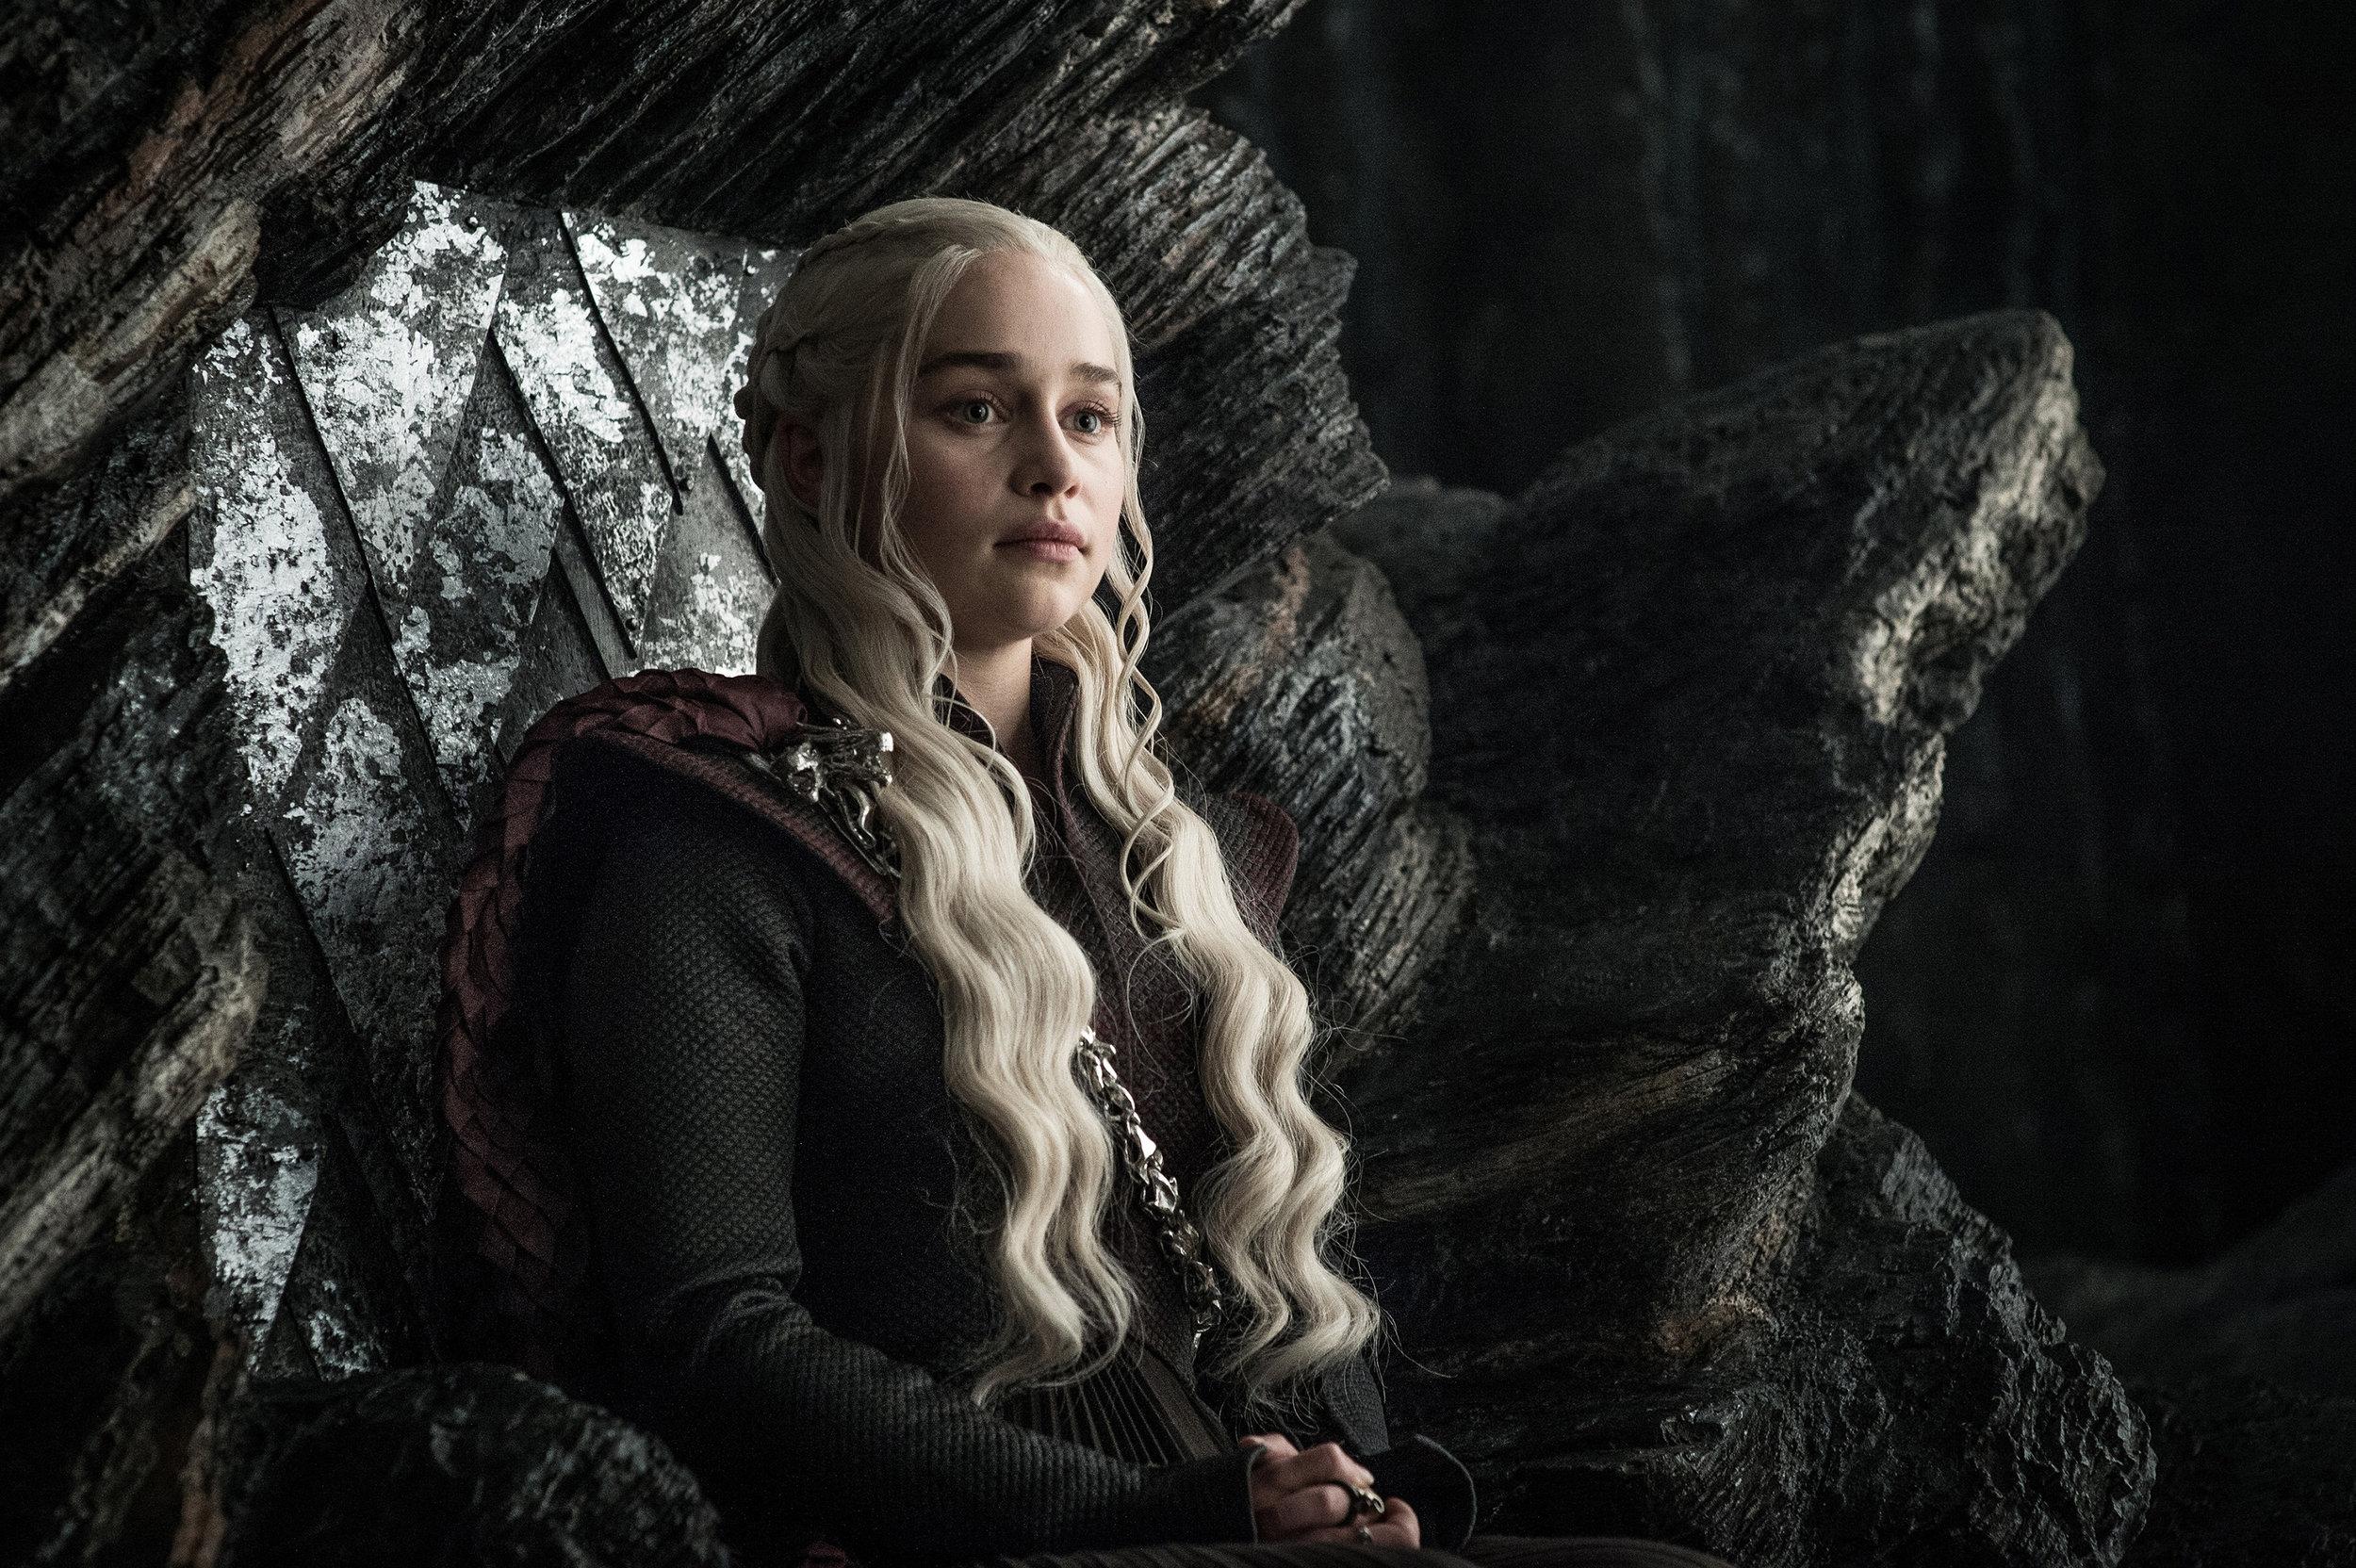 Daenerys Targaryen, would-be Queen of the Seven Kingdoms